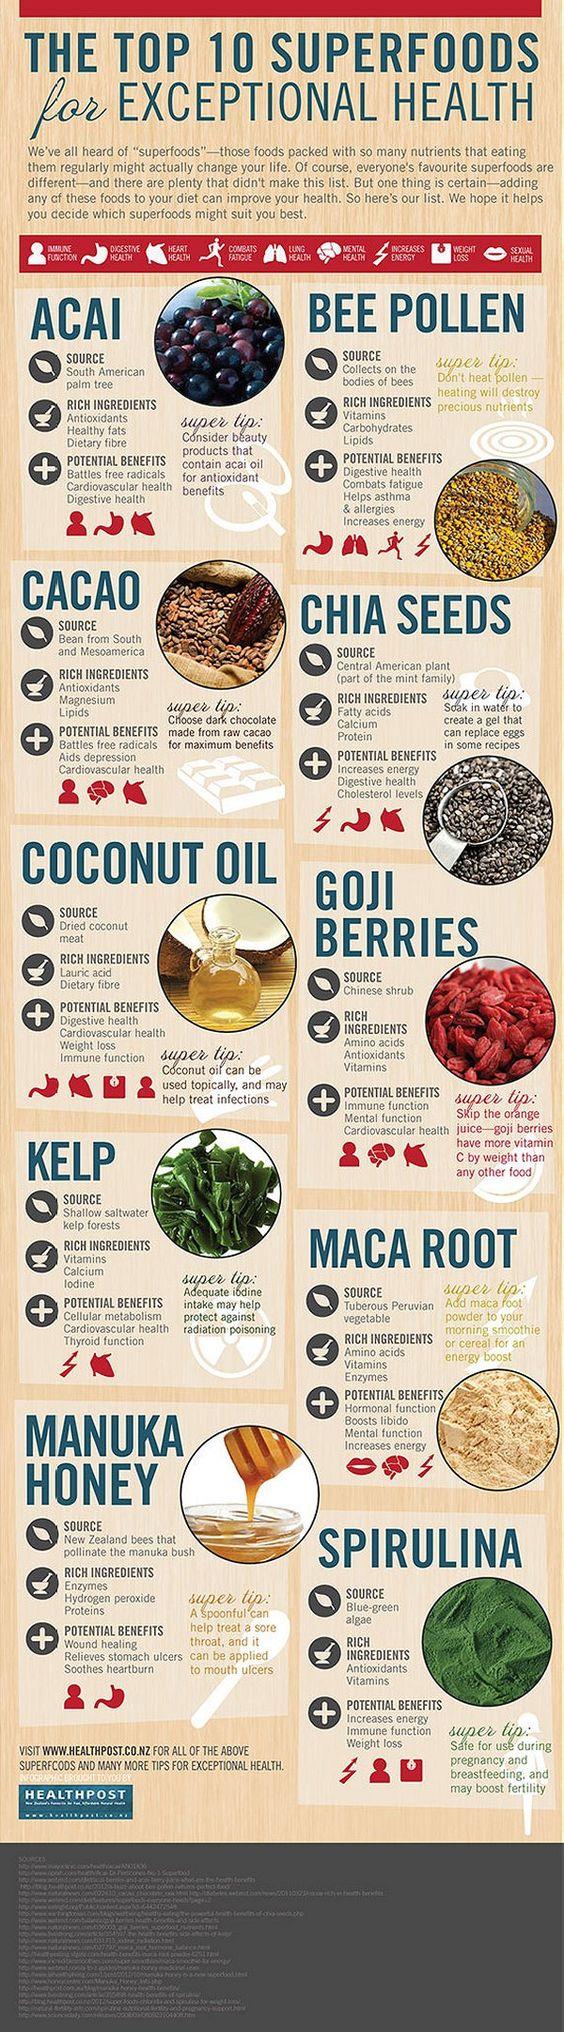 Top 10 Super Foods: coconut oil, Goji Berries, acai, kelp, maca root, bee pollen, chia seeds, spirulina, manuka honey, cacao   @andwhatelse